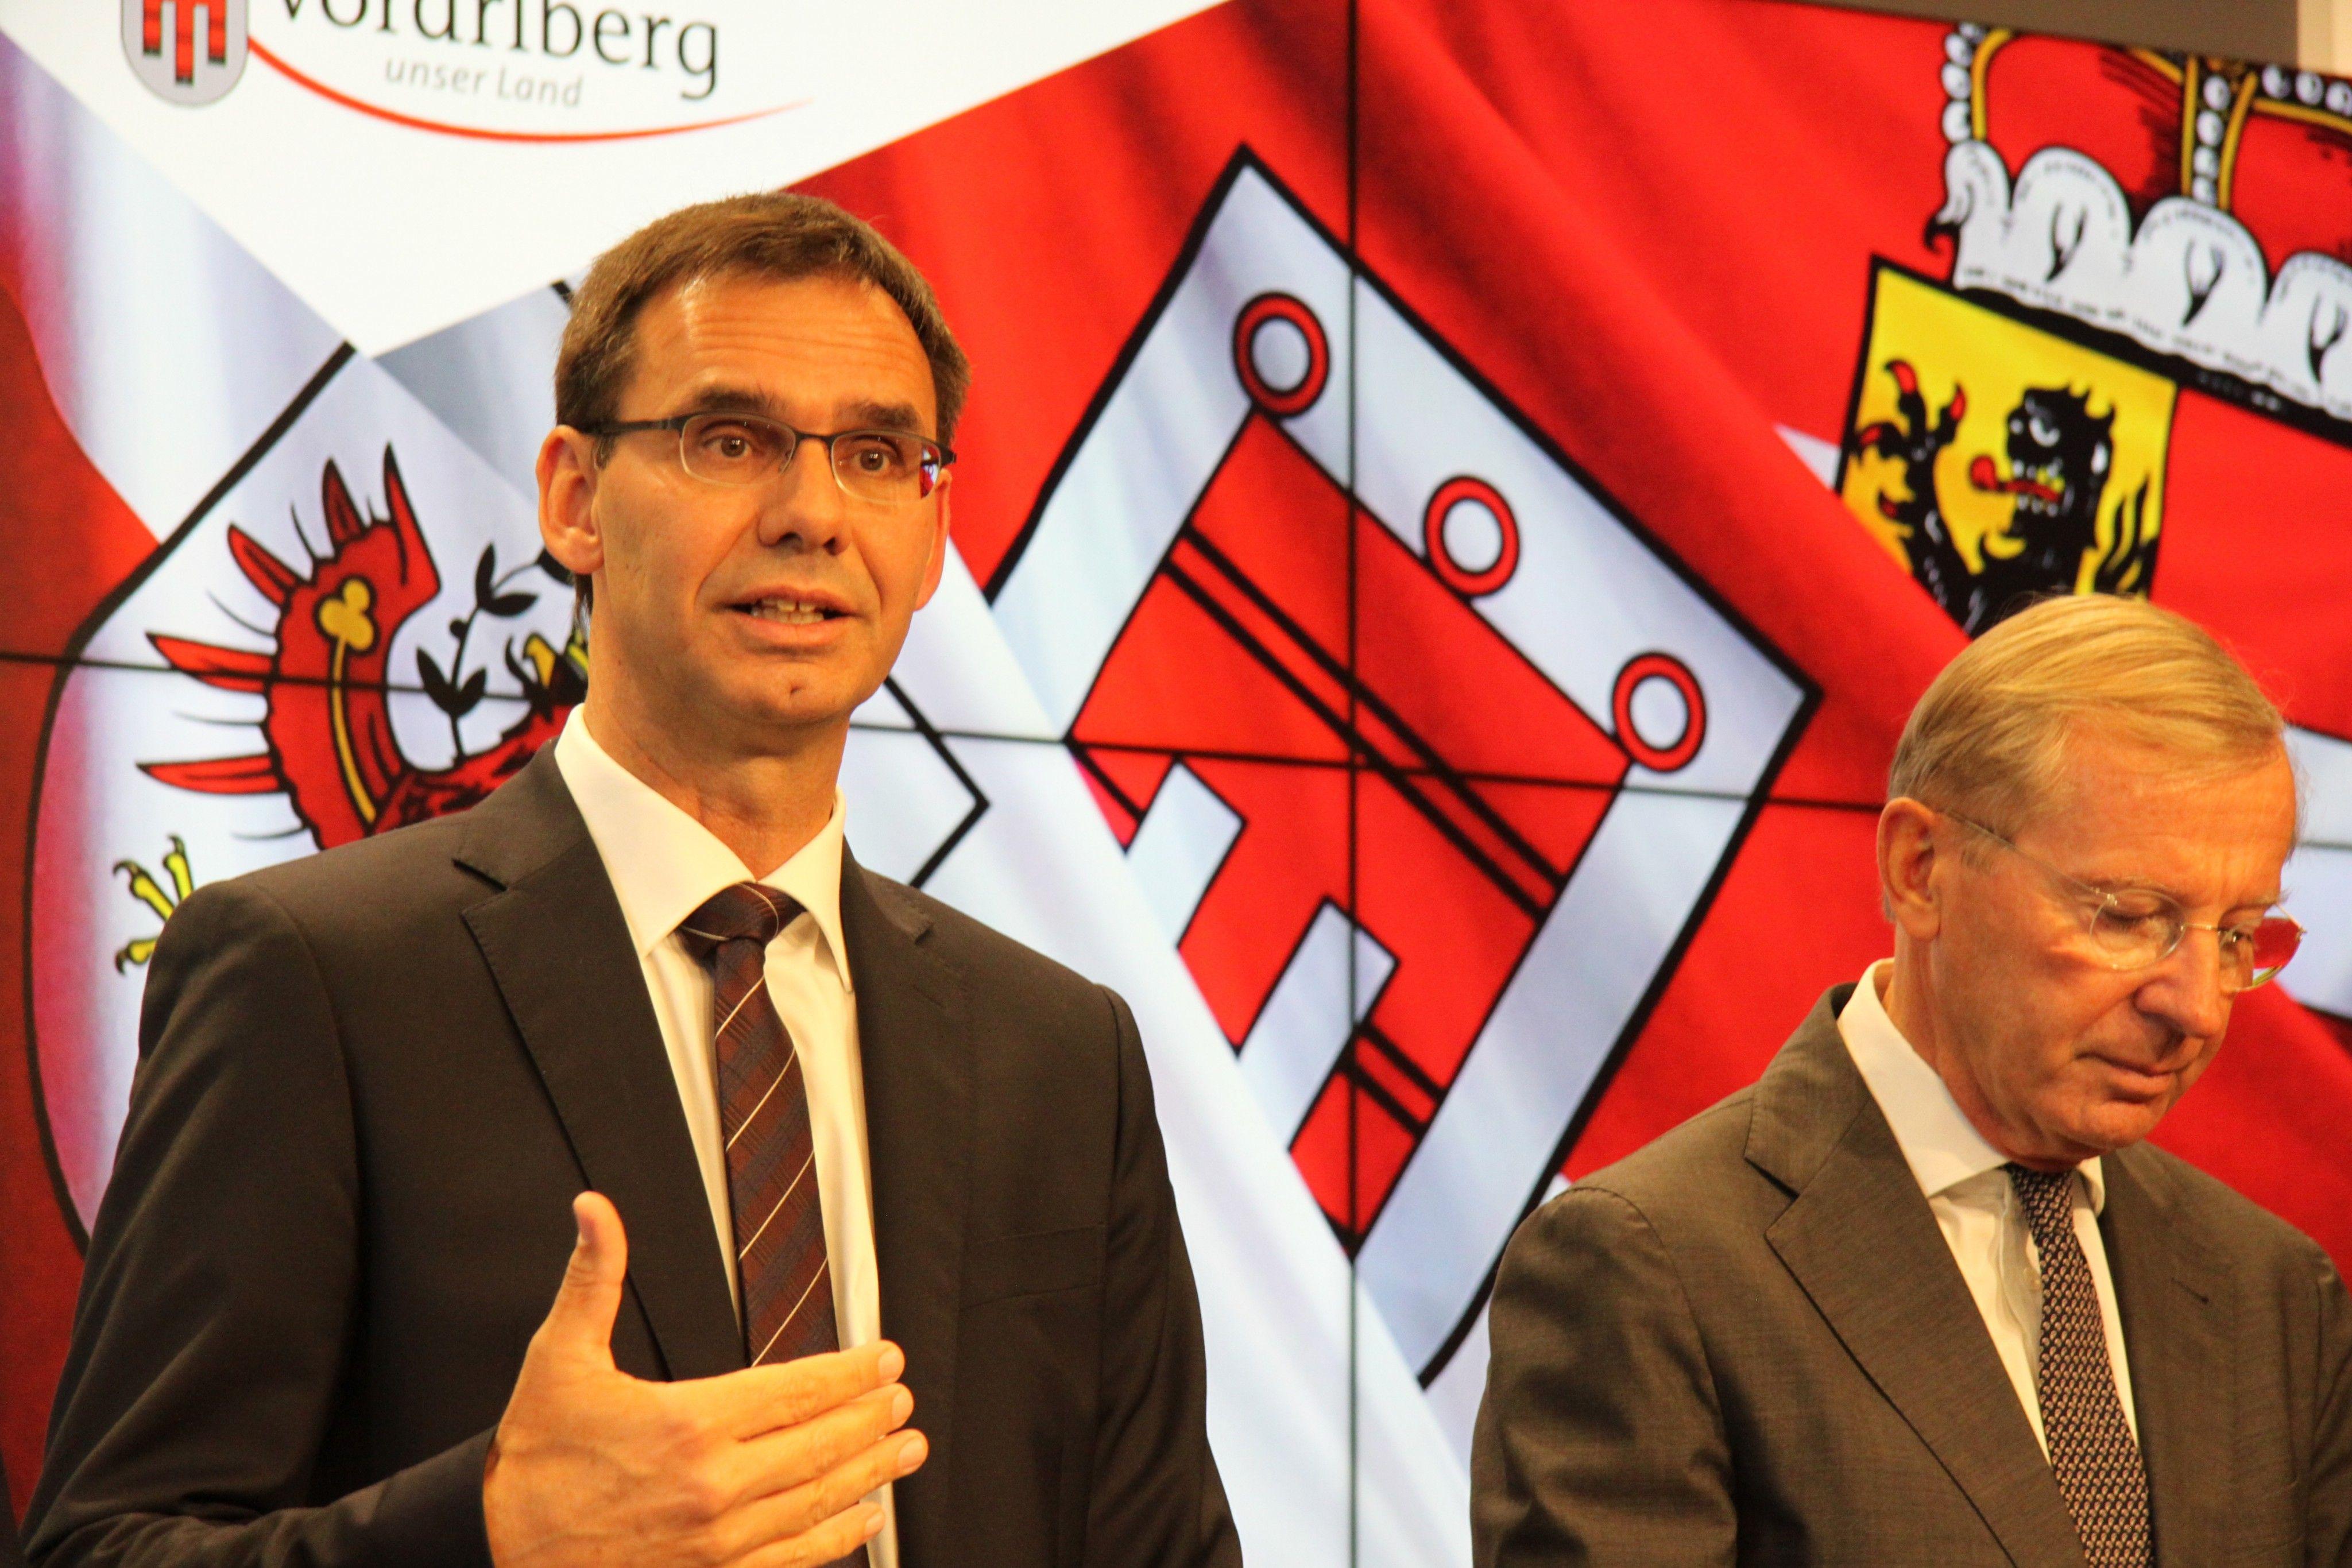 Wallner will S18 statt Fahrverbote wie Tirol